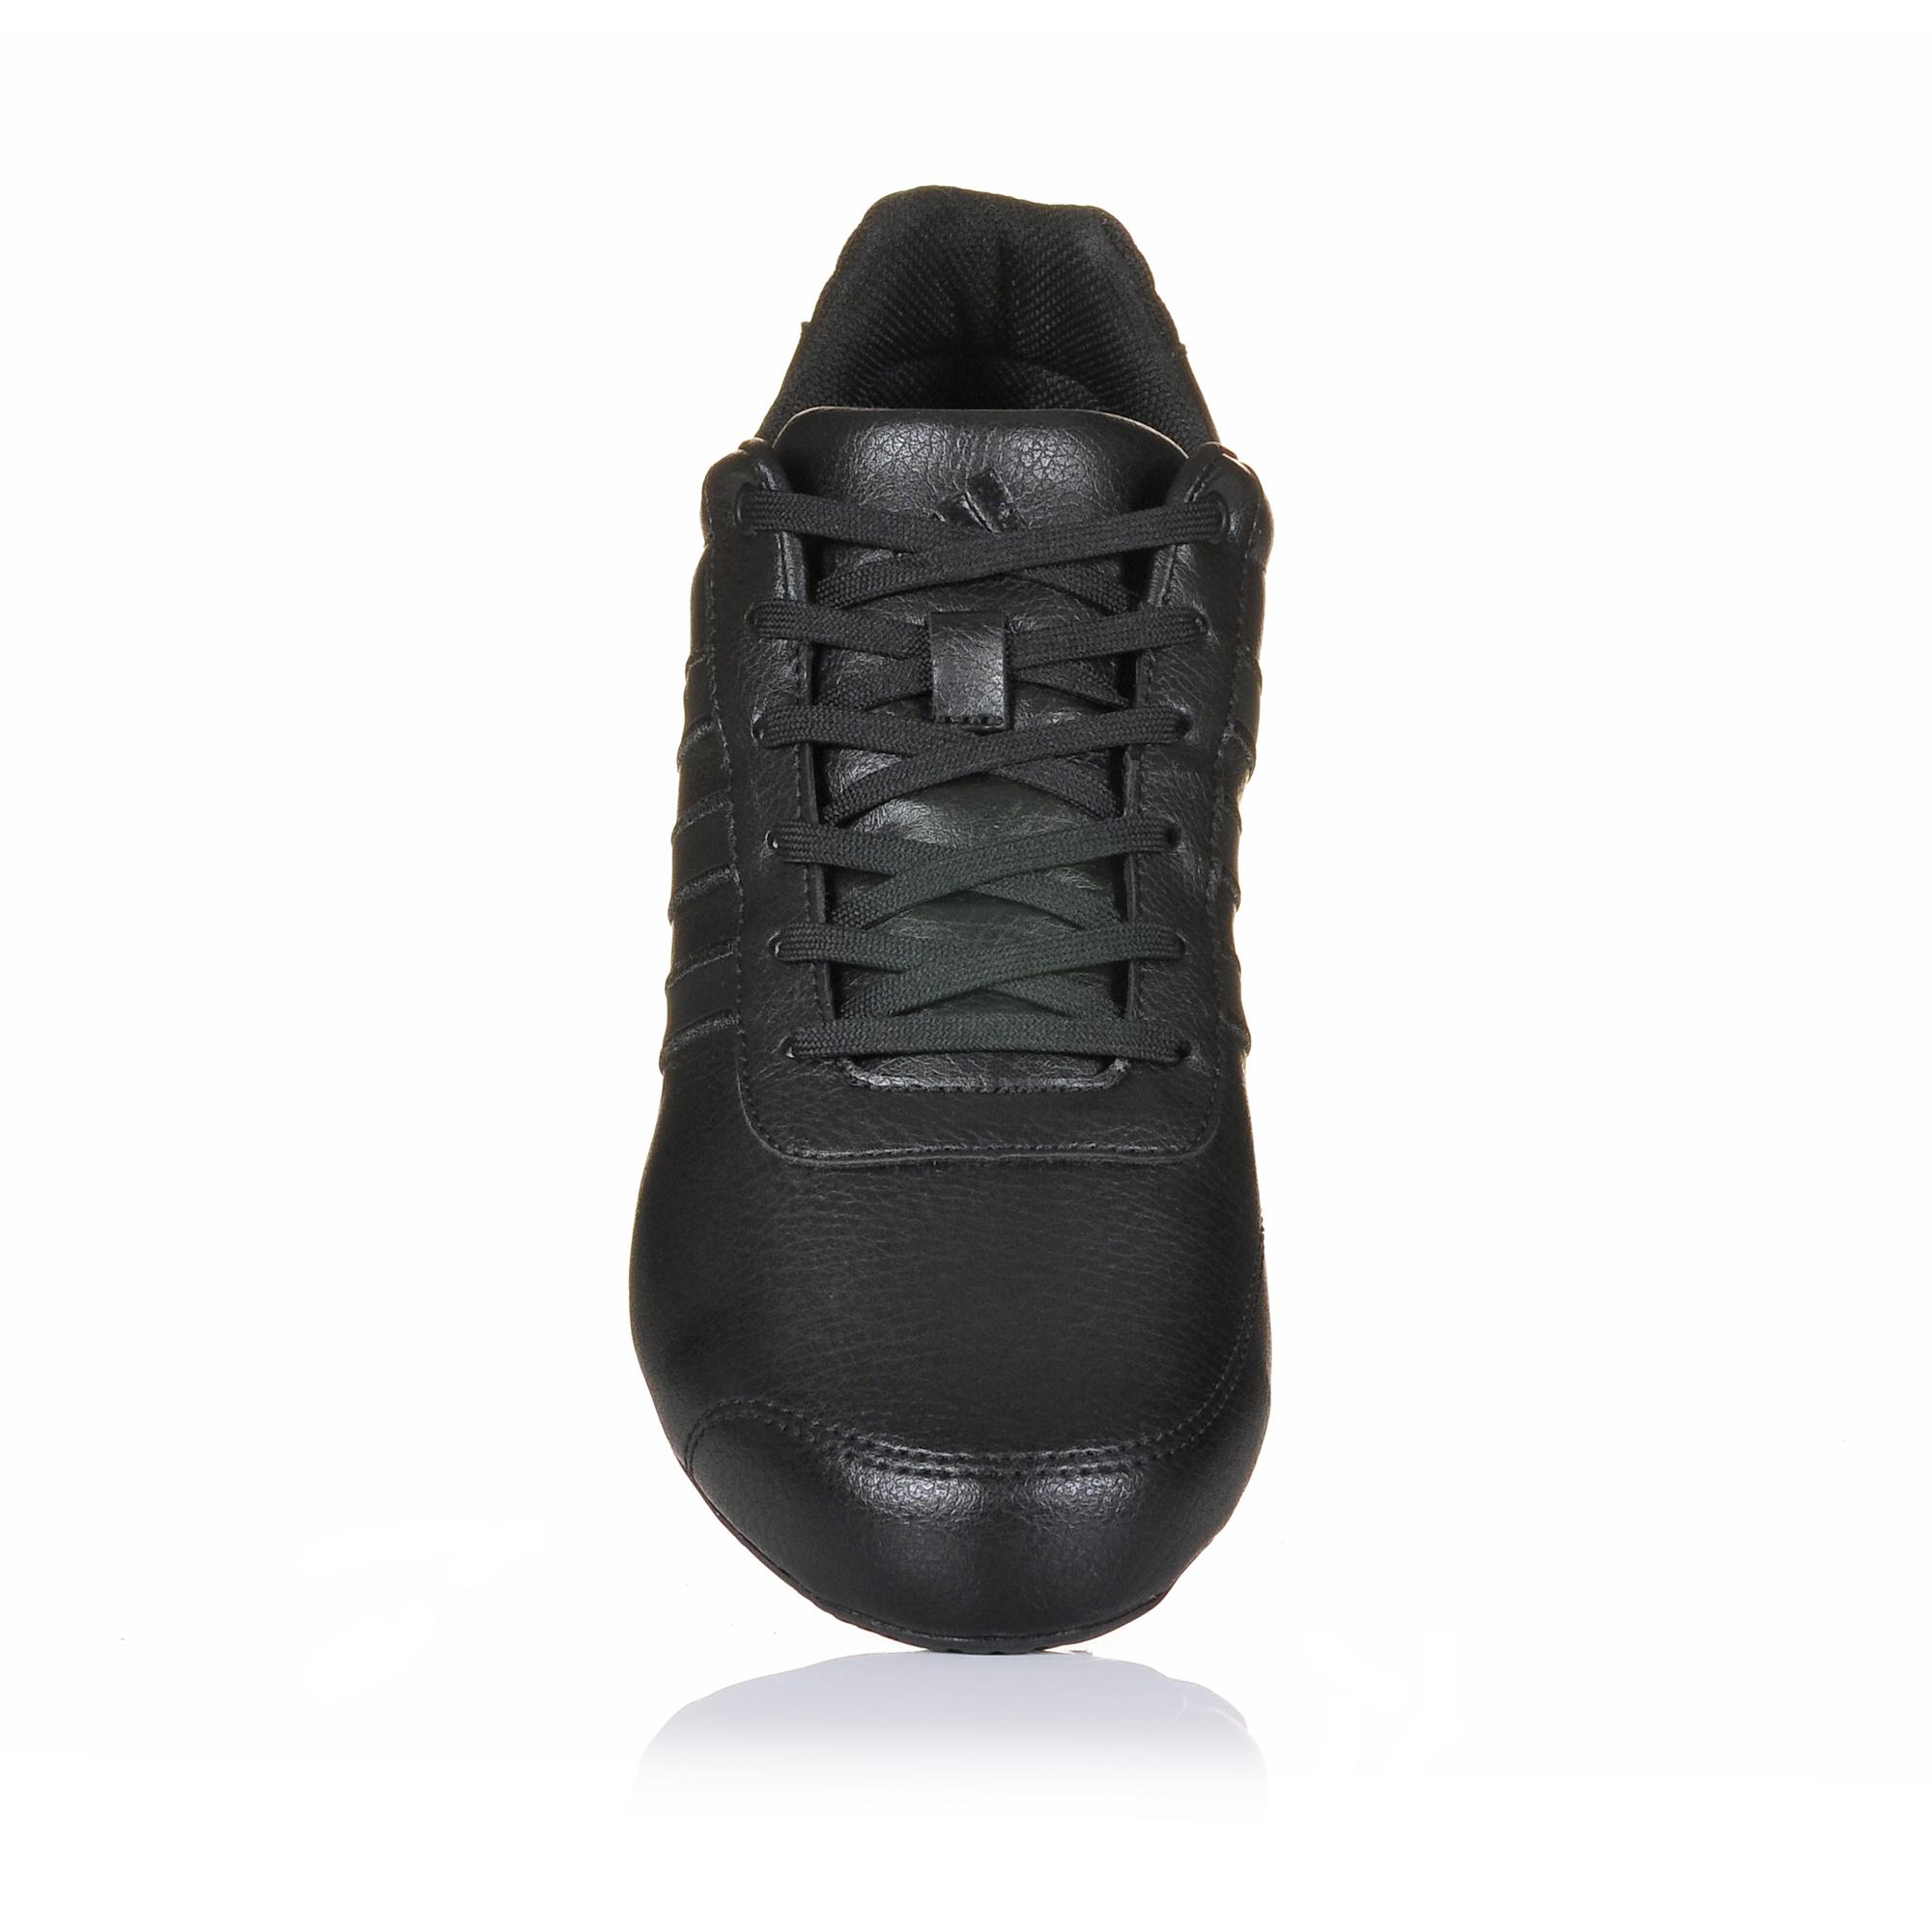 adidas Trackstar XLT Racing Shoes